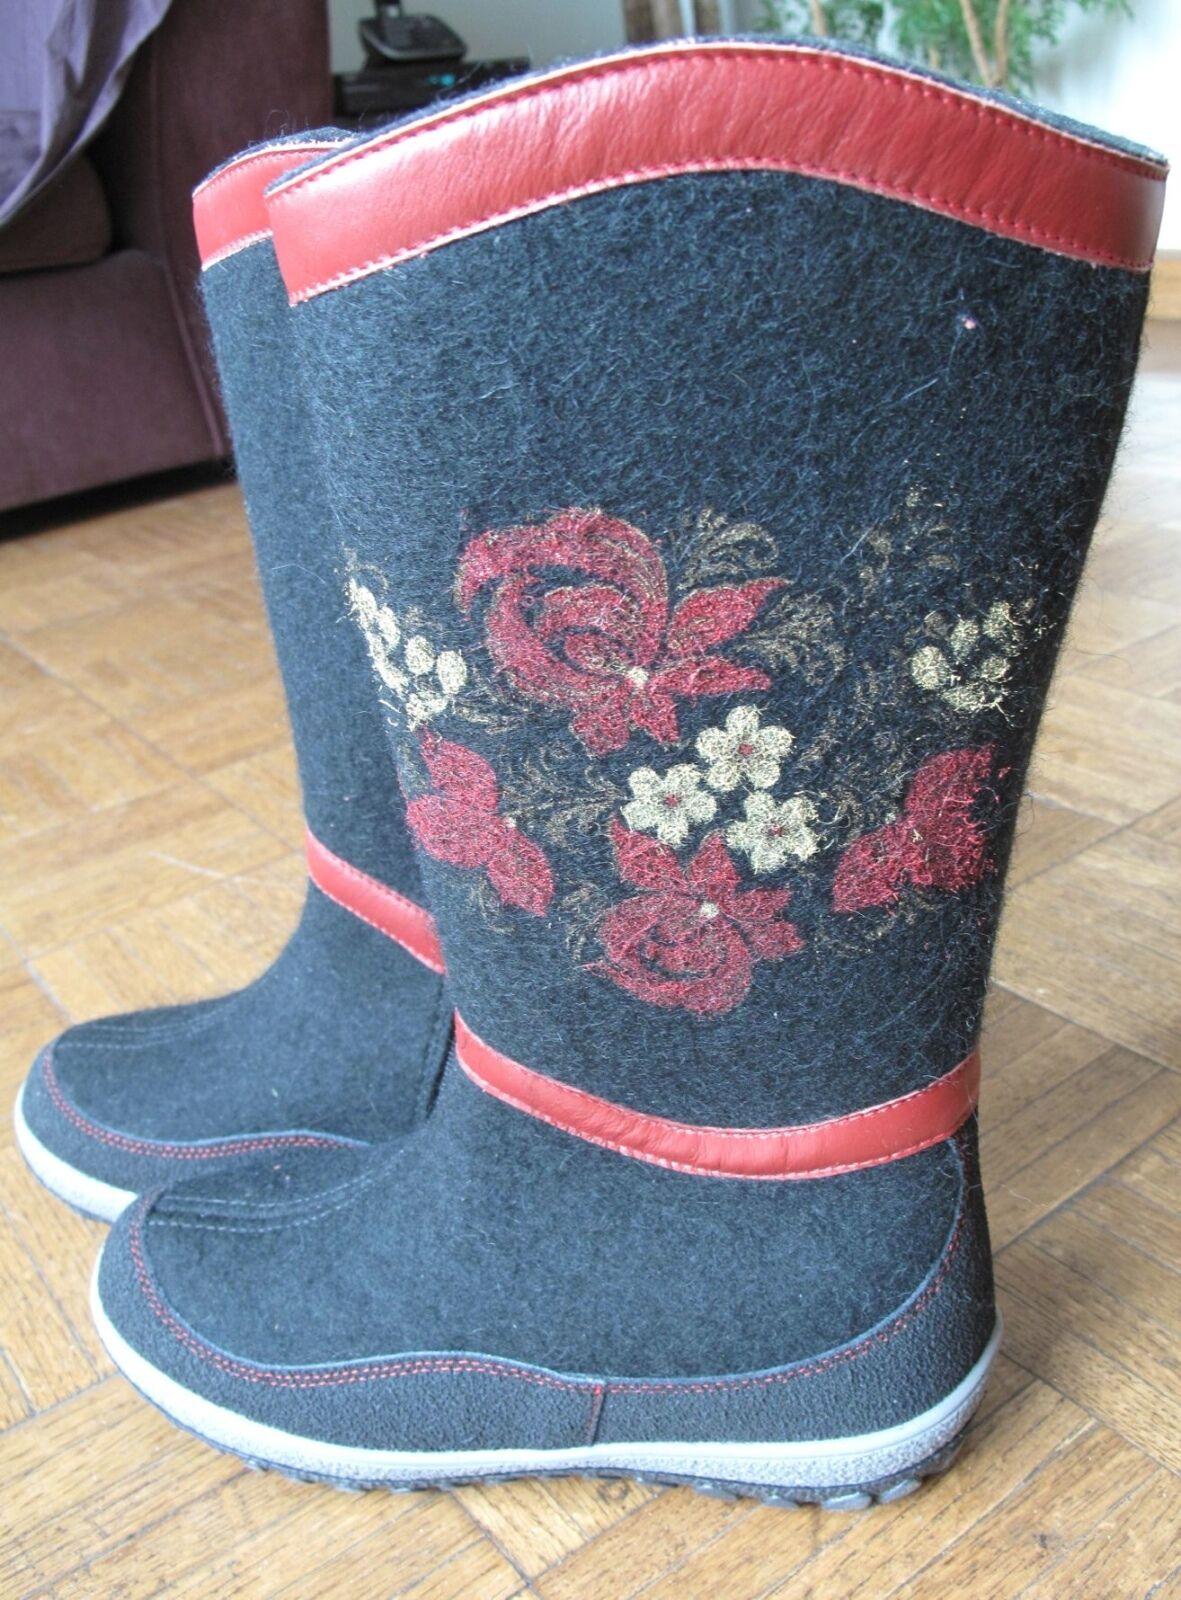 Ruso Para Mujer Fieltro Fieltro Fieltro Negro botas Impreso Flores Talle 9 O 39 hecho Rusia валенки  ventas en linea